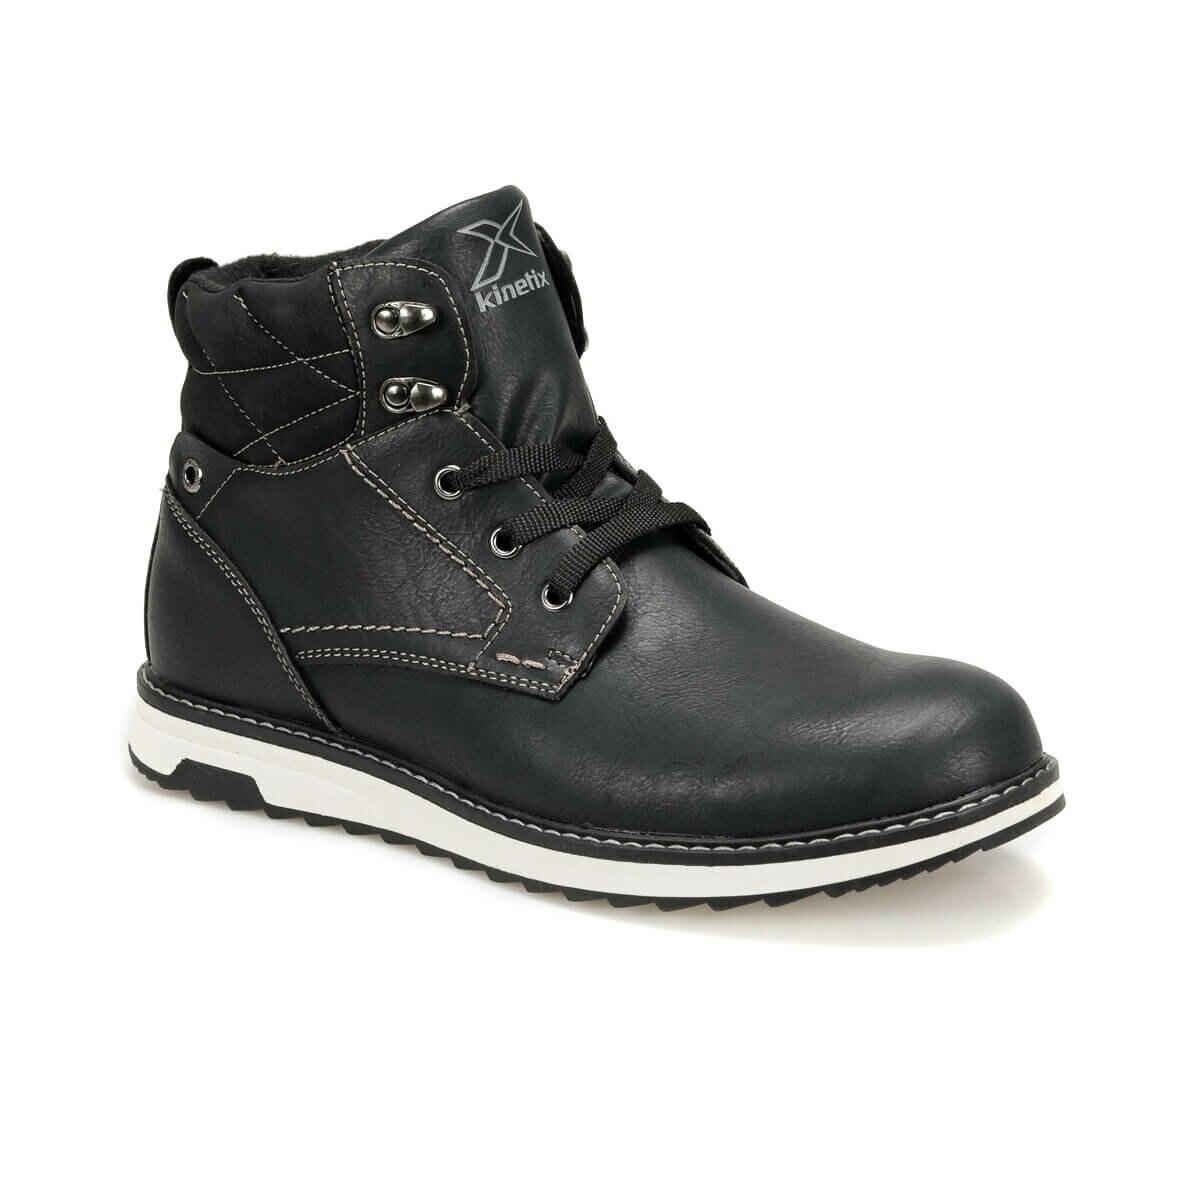 FLO RYUGA Black Men Boots KINETIX